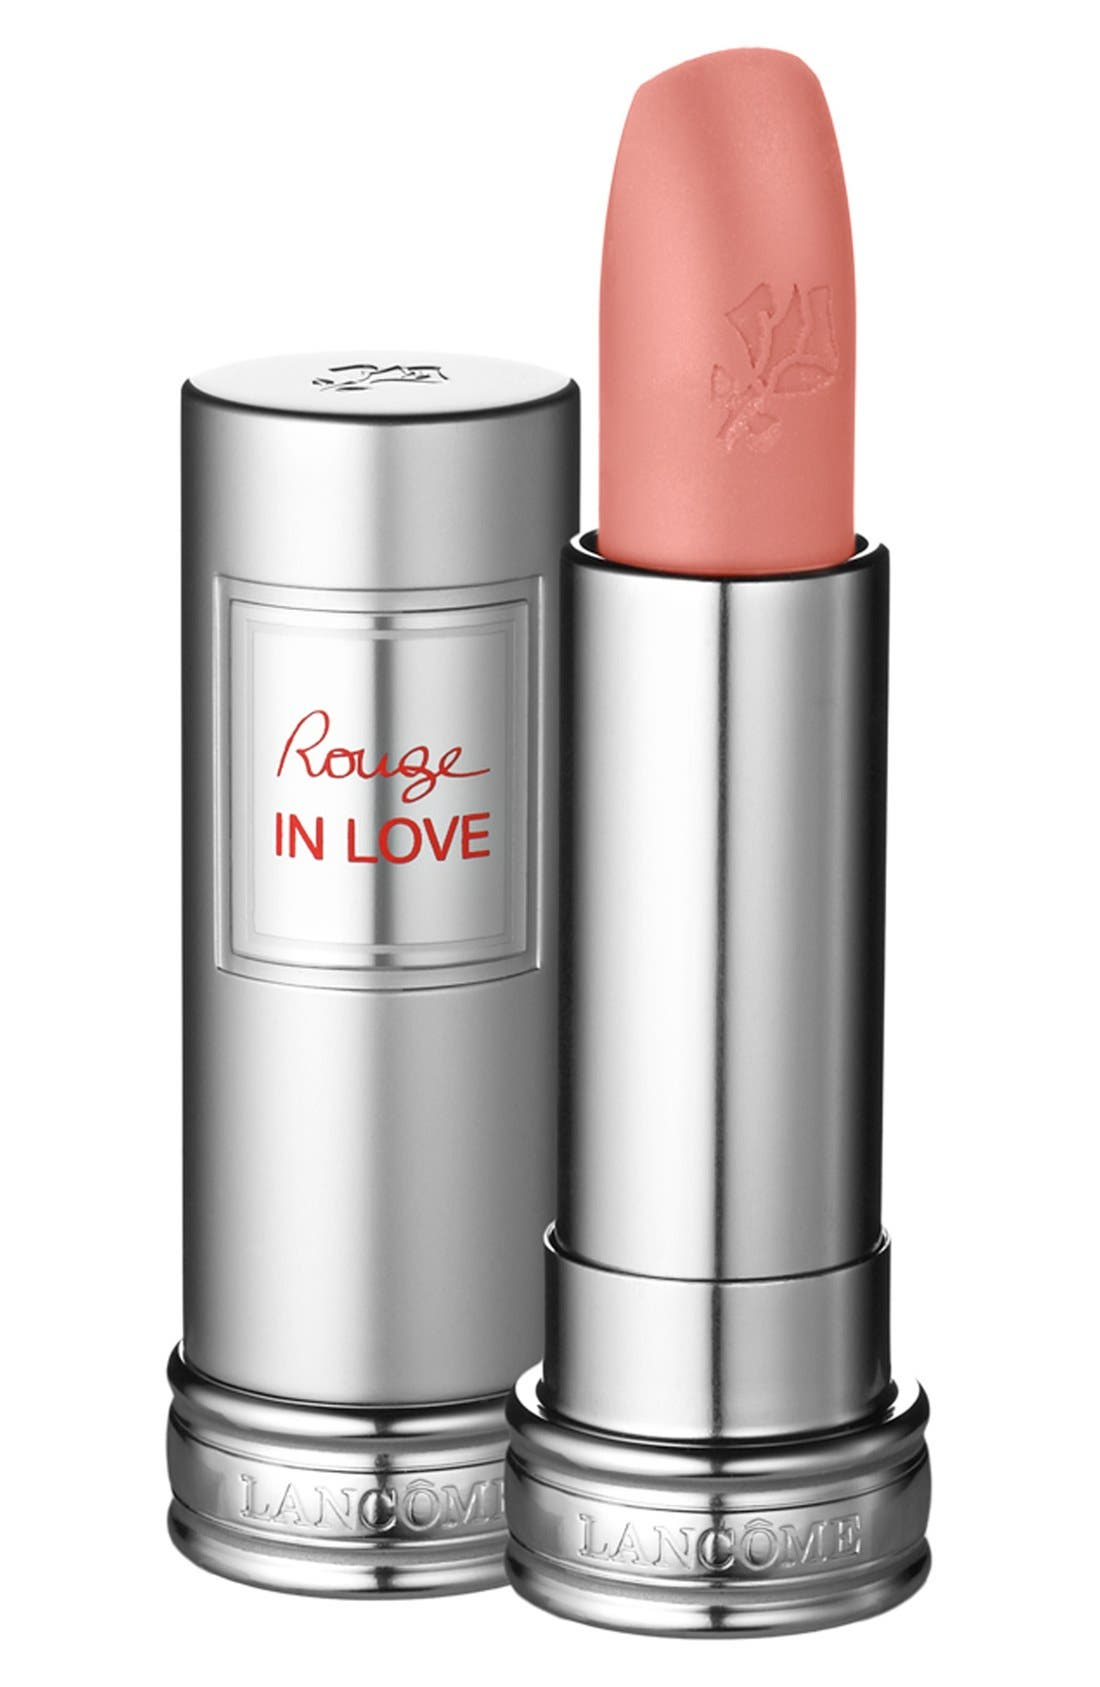 Rouge in Love Lipstick,                             Main thumbnail 1, color,                             ROSE TEA